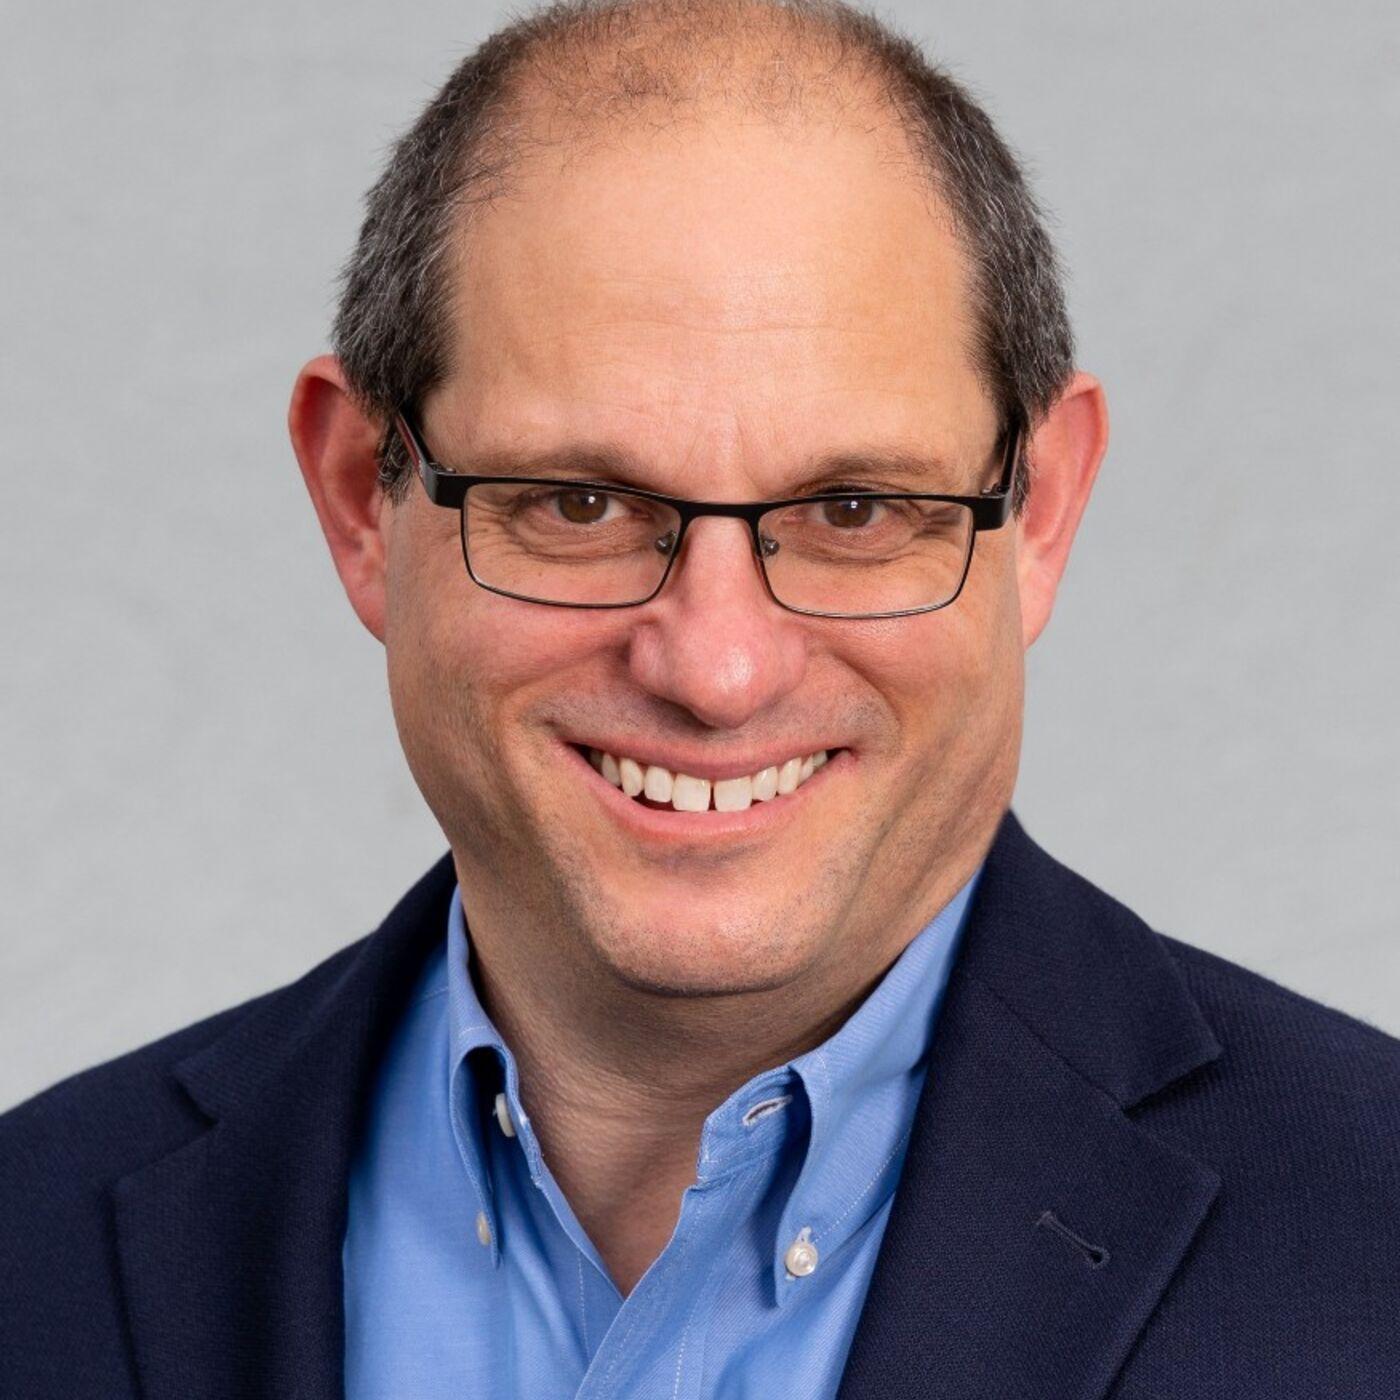 Steven Seiden of Acquired Data Solutions